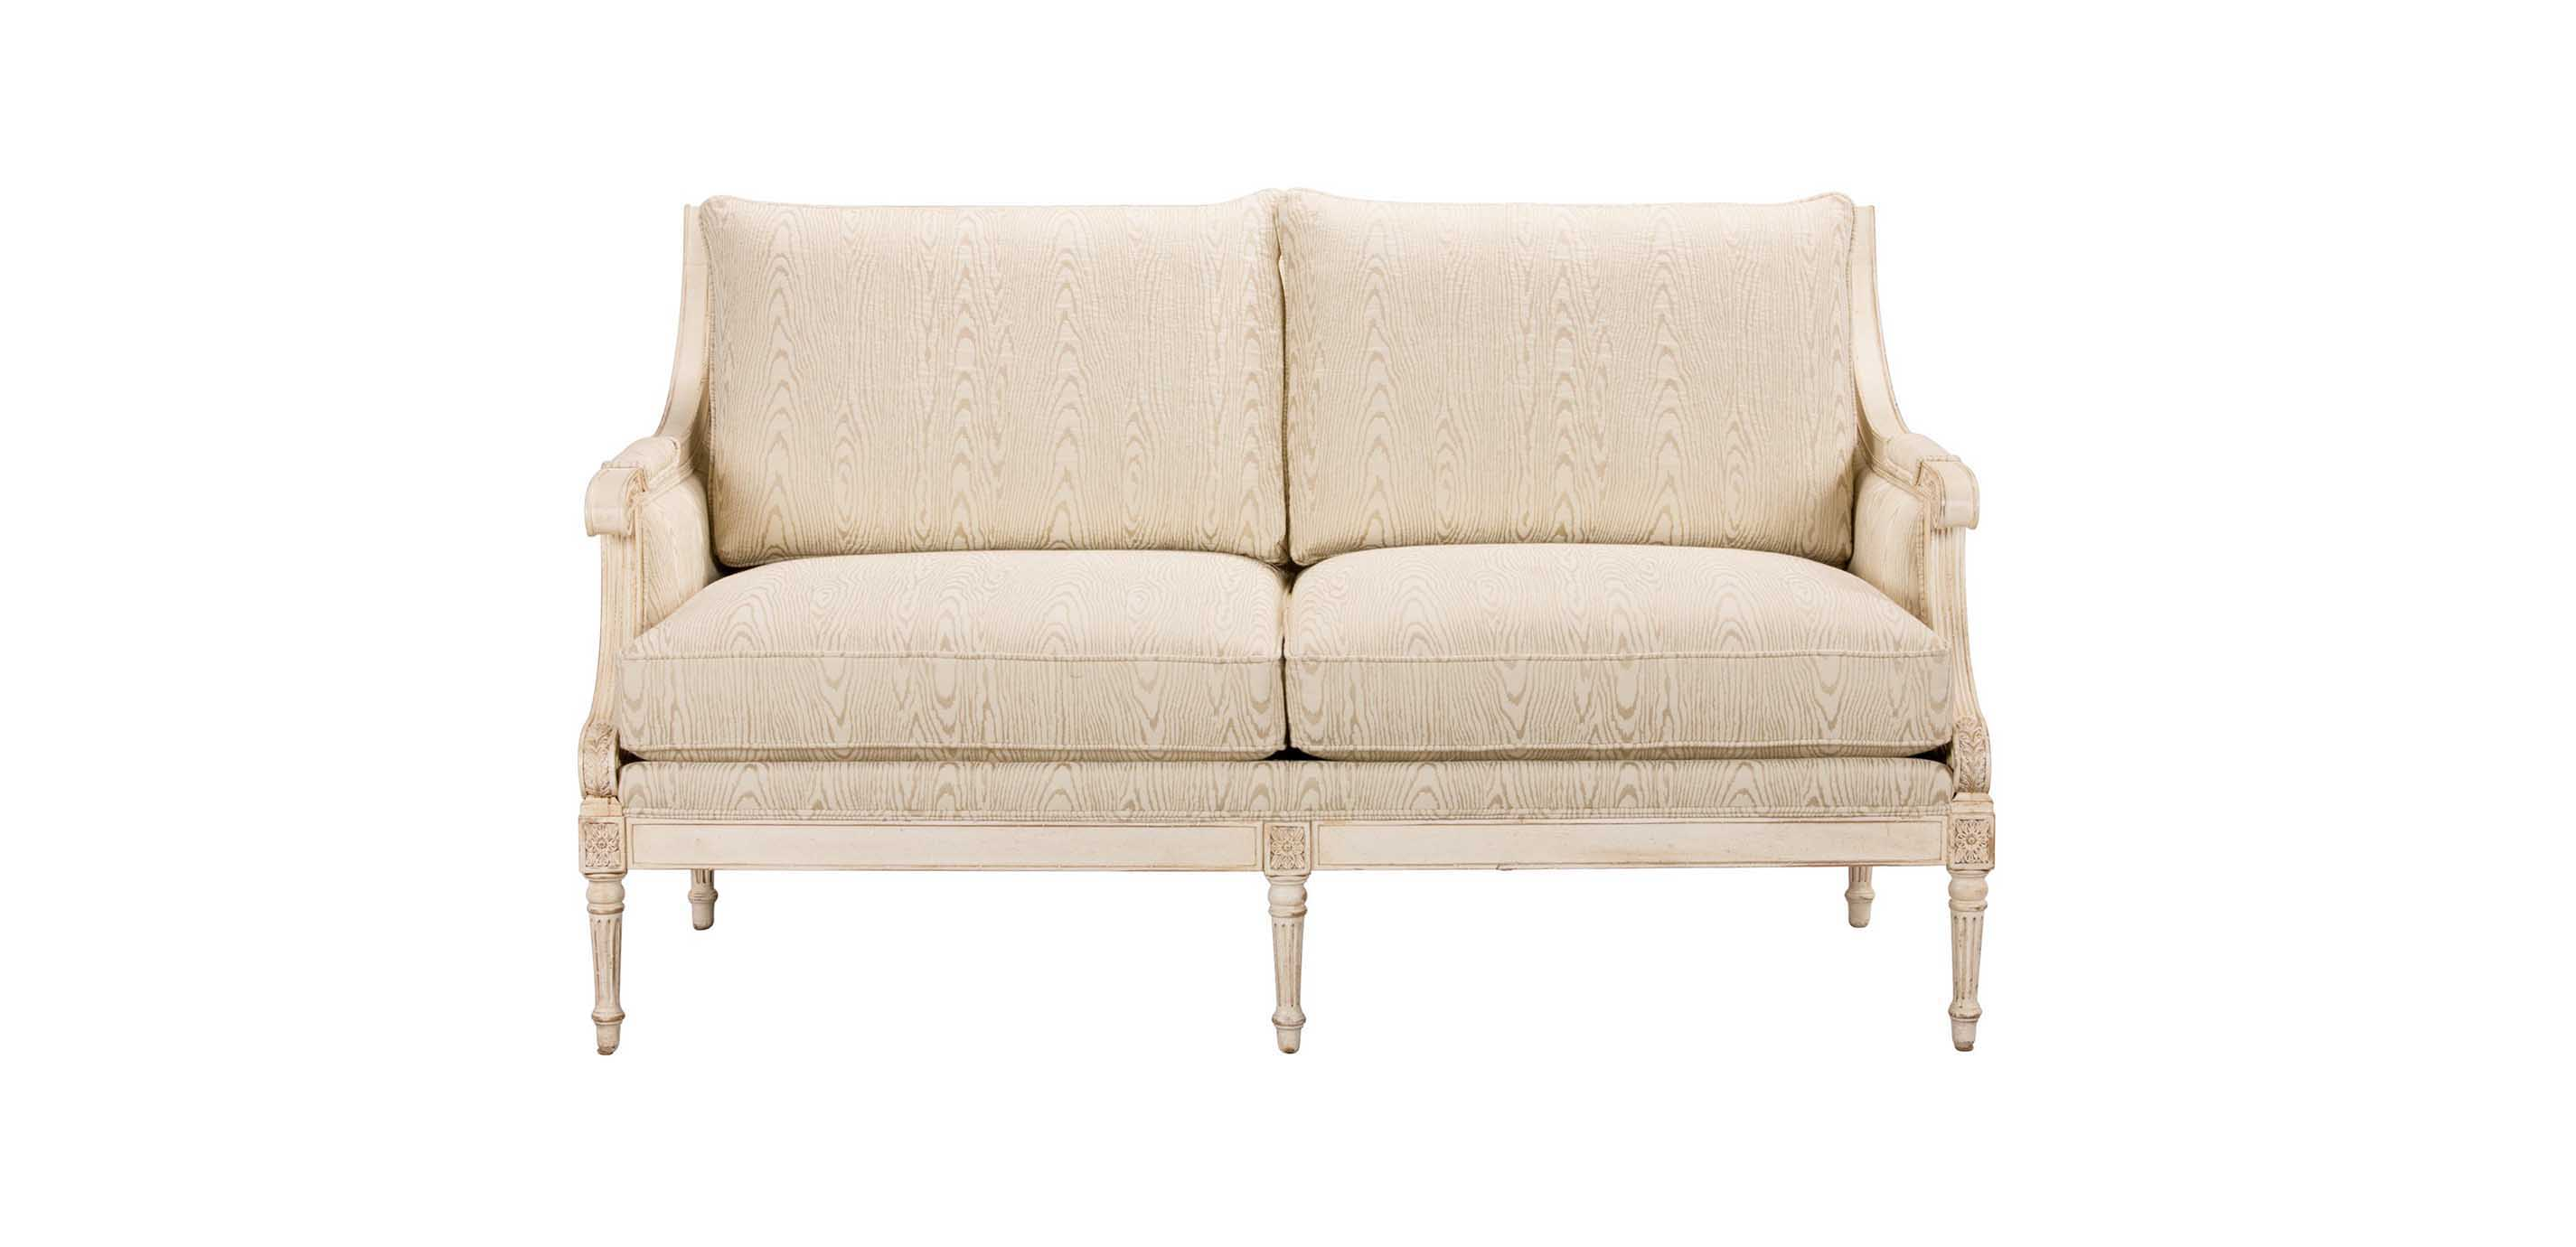 more of badcock loveseat grey picture sofa reclining ritz furniture